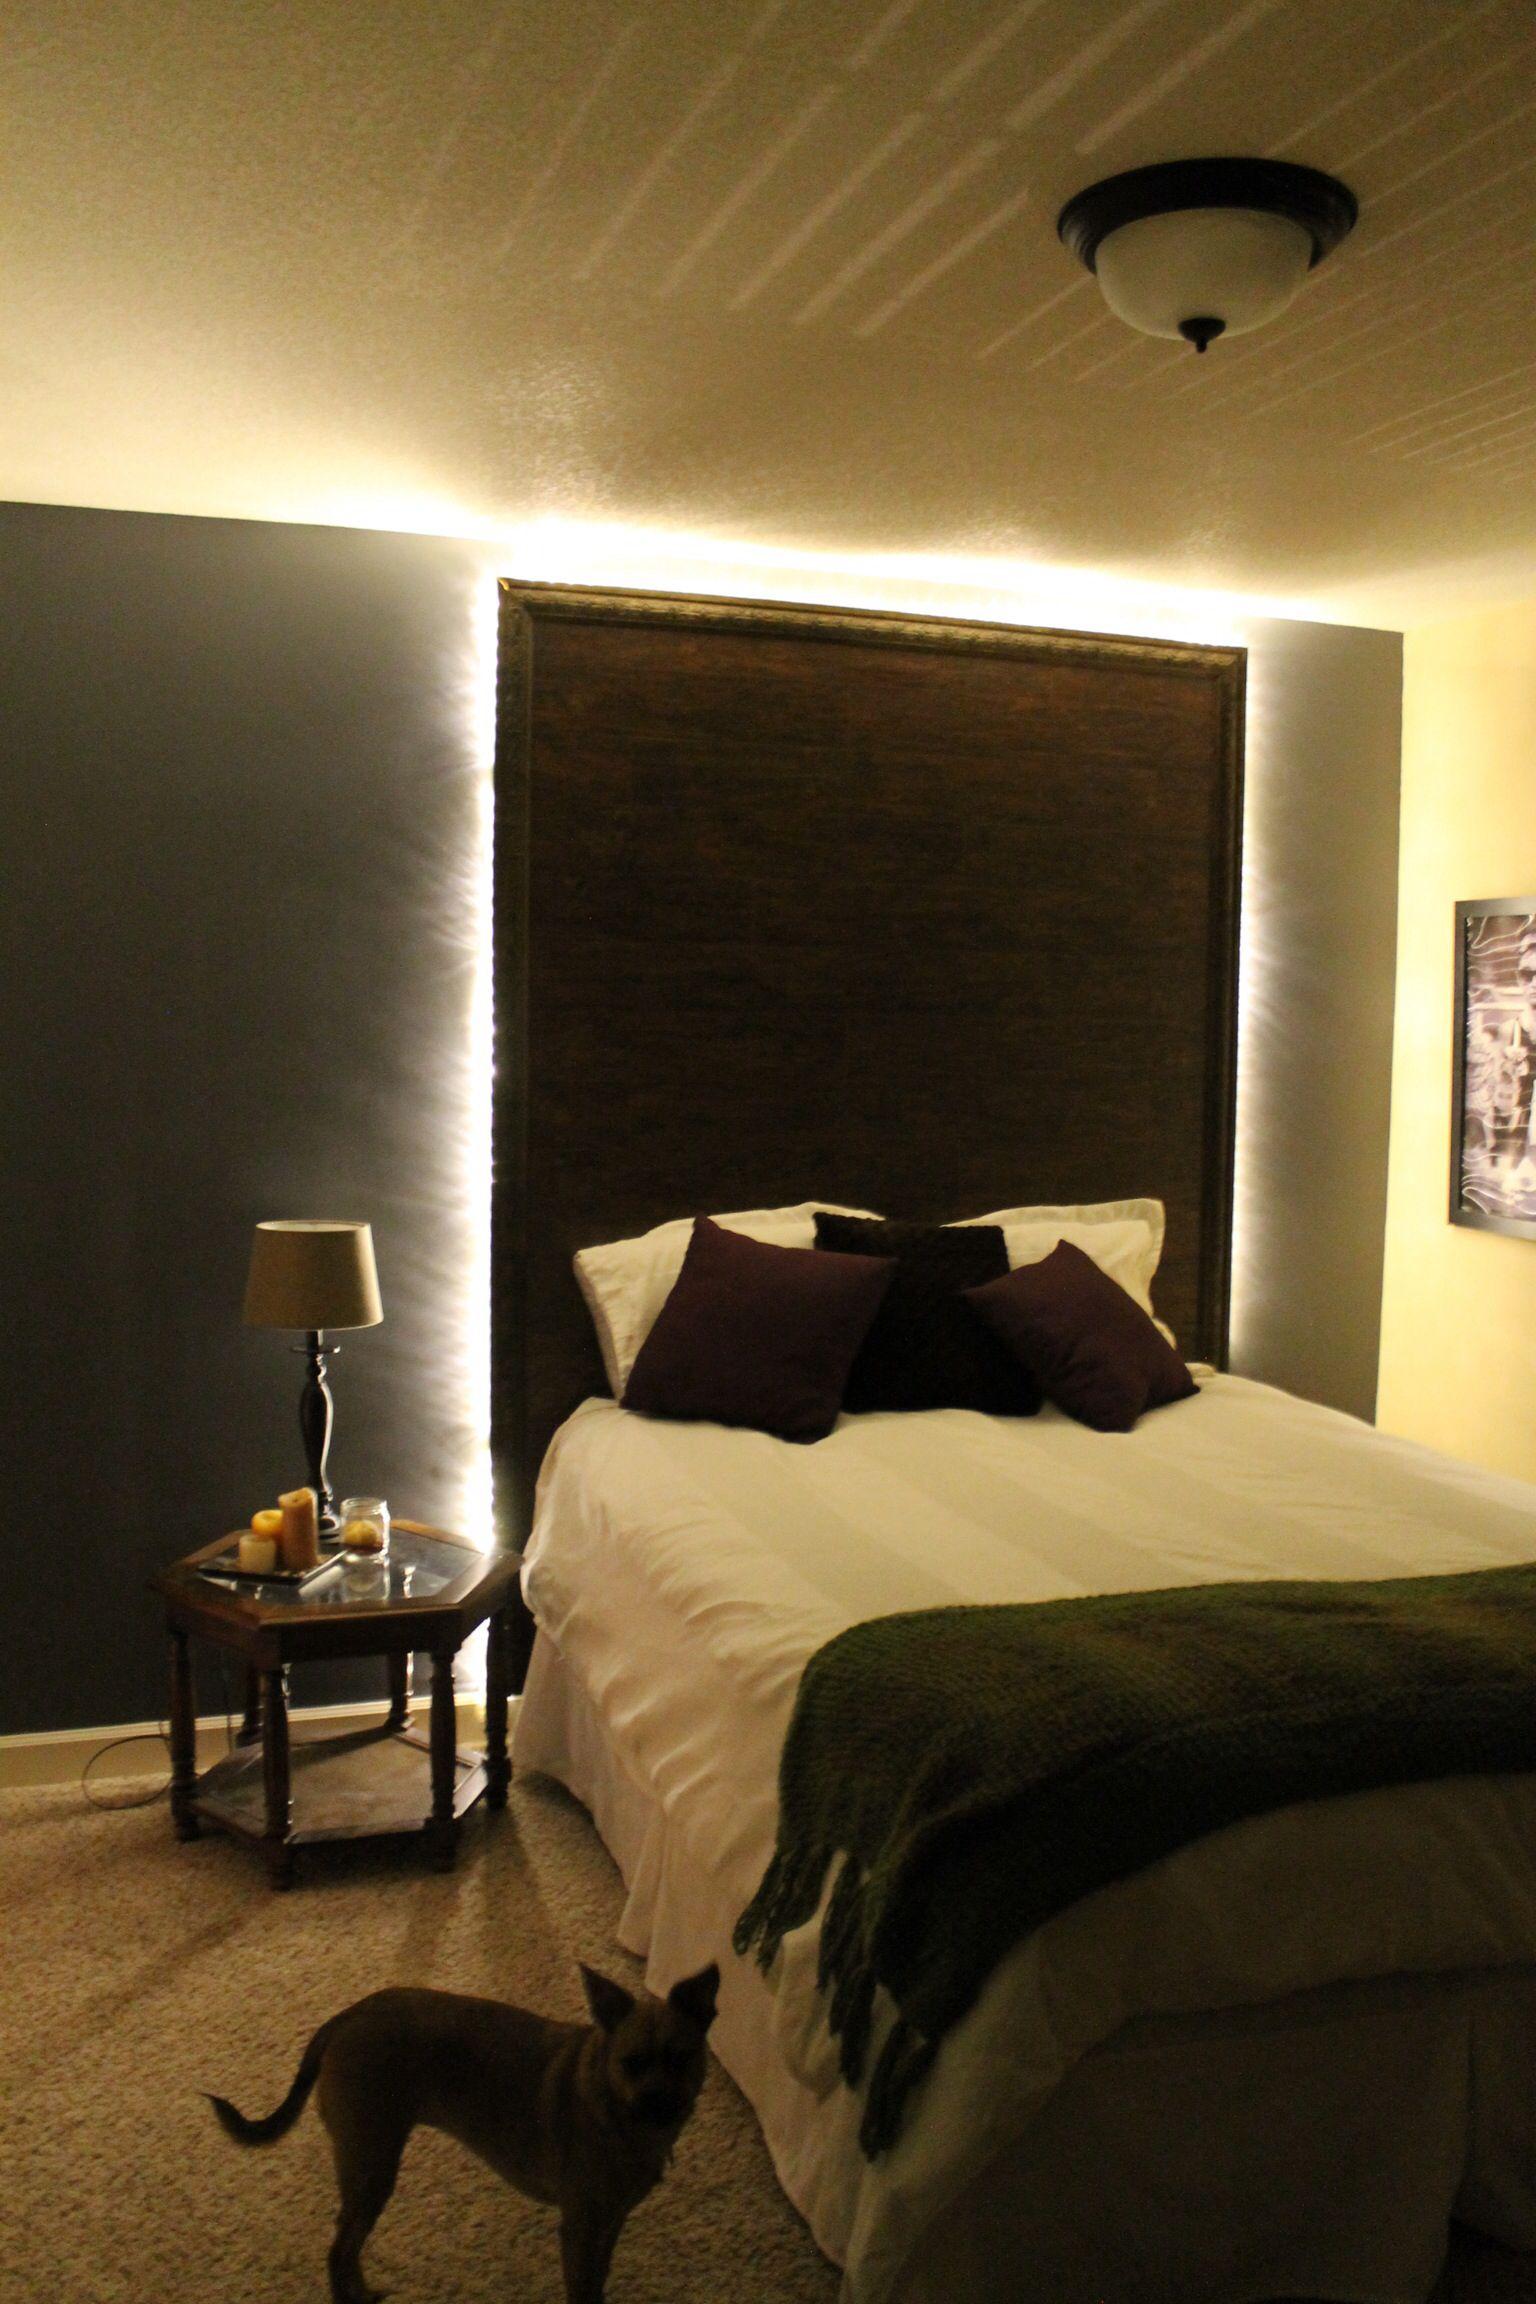 Lighted headboard Home decor, Headboard with lights